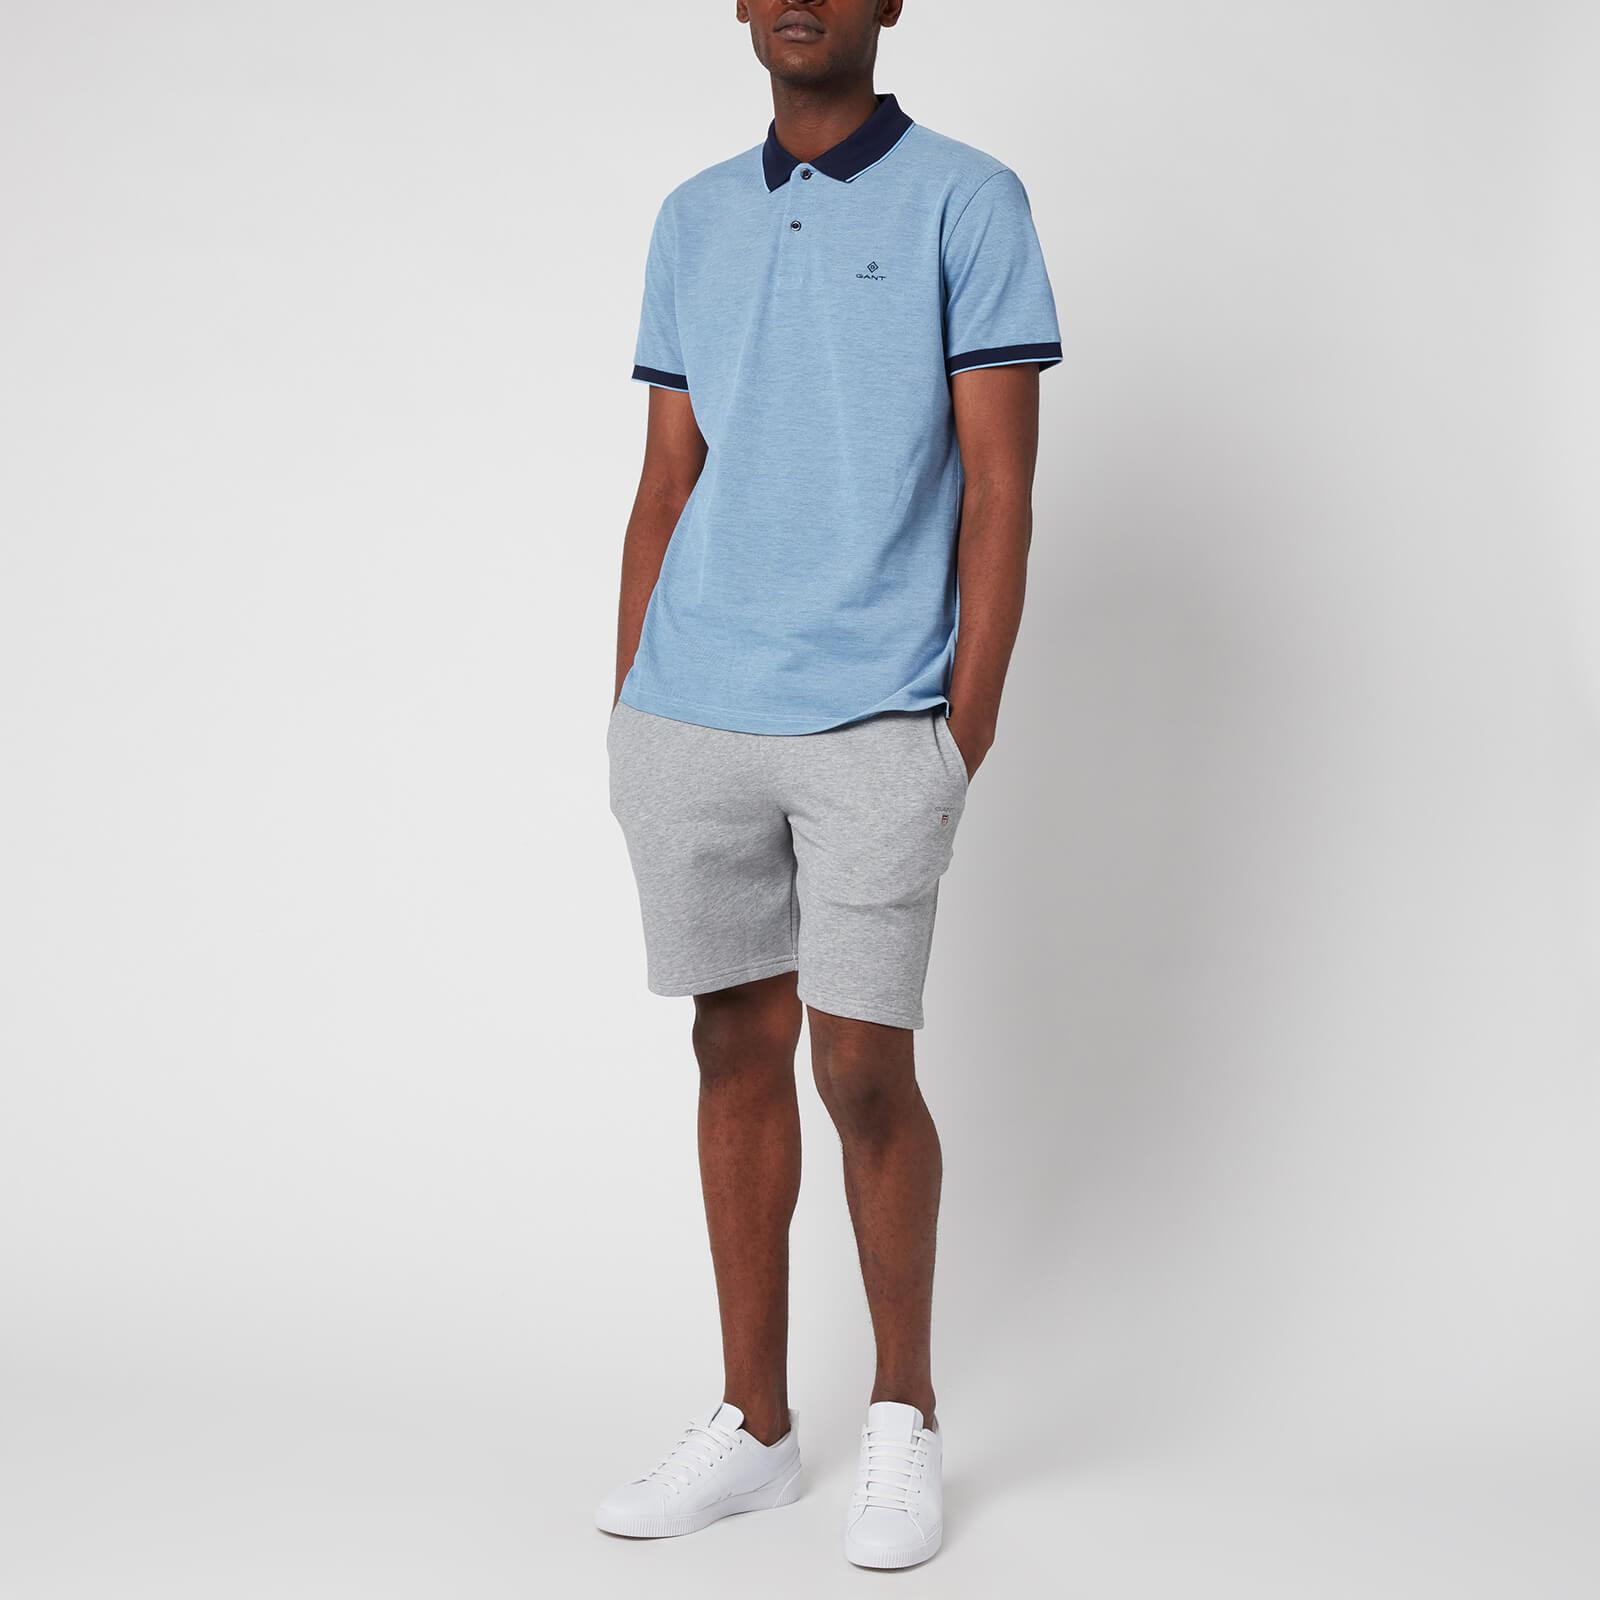 Gant Men's Oxford Pique Polo Shirt - Powder Blue - S 2012012477 General Clothing, Blue